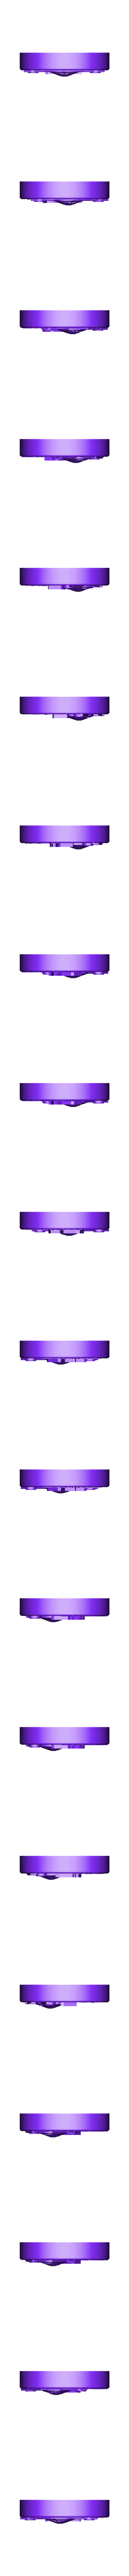 c17.stl Download free STL file C-17 Flight Token • Object to 3D print, re3D